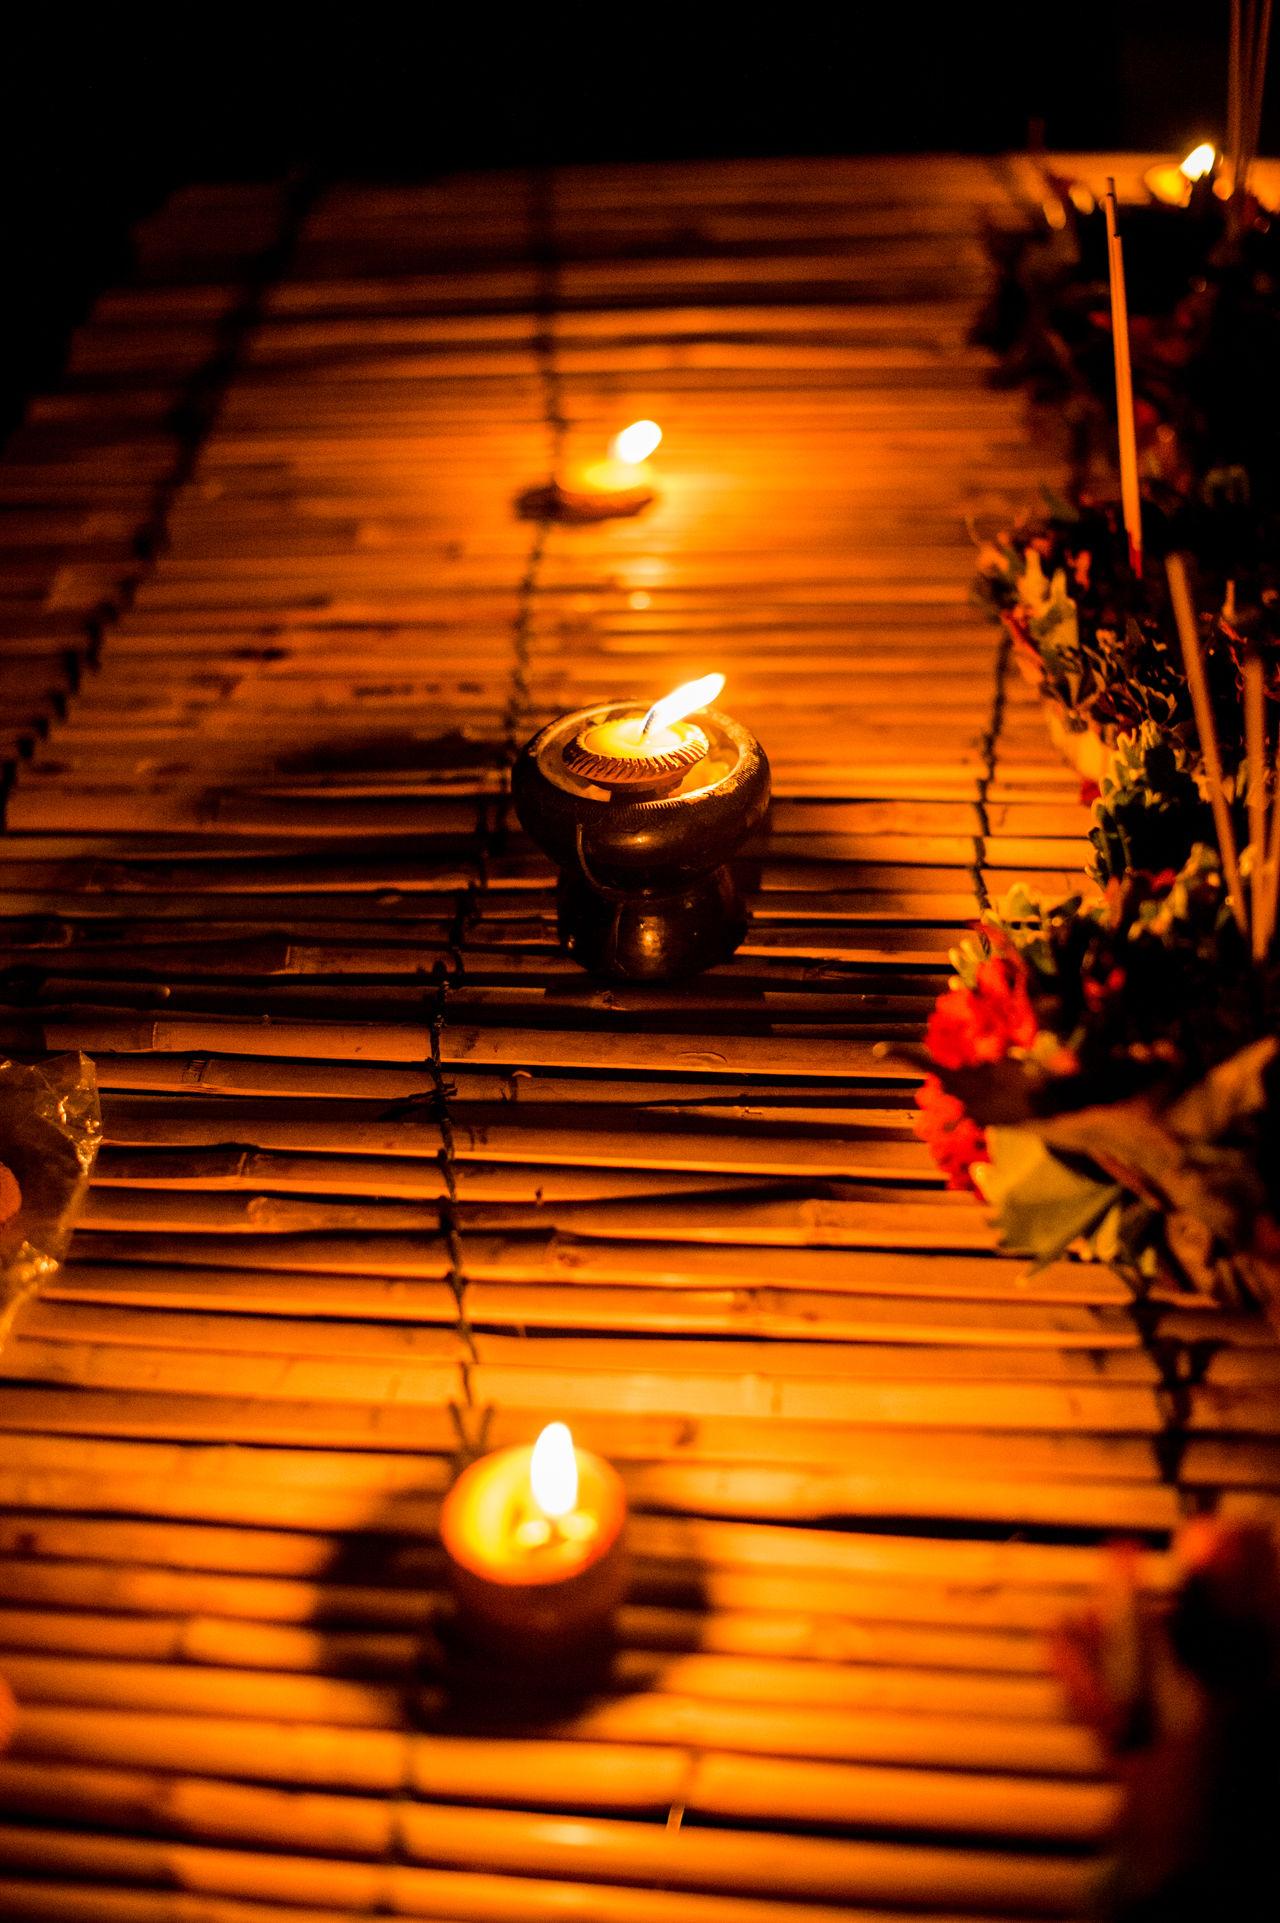 Burning Candle Close-up Diya - Oil Lamp Flame Flower Heat - Temperature Hope Illuminated Indoors  Night No People Oil Lamp Religion Spirituality Tea Light